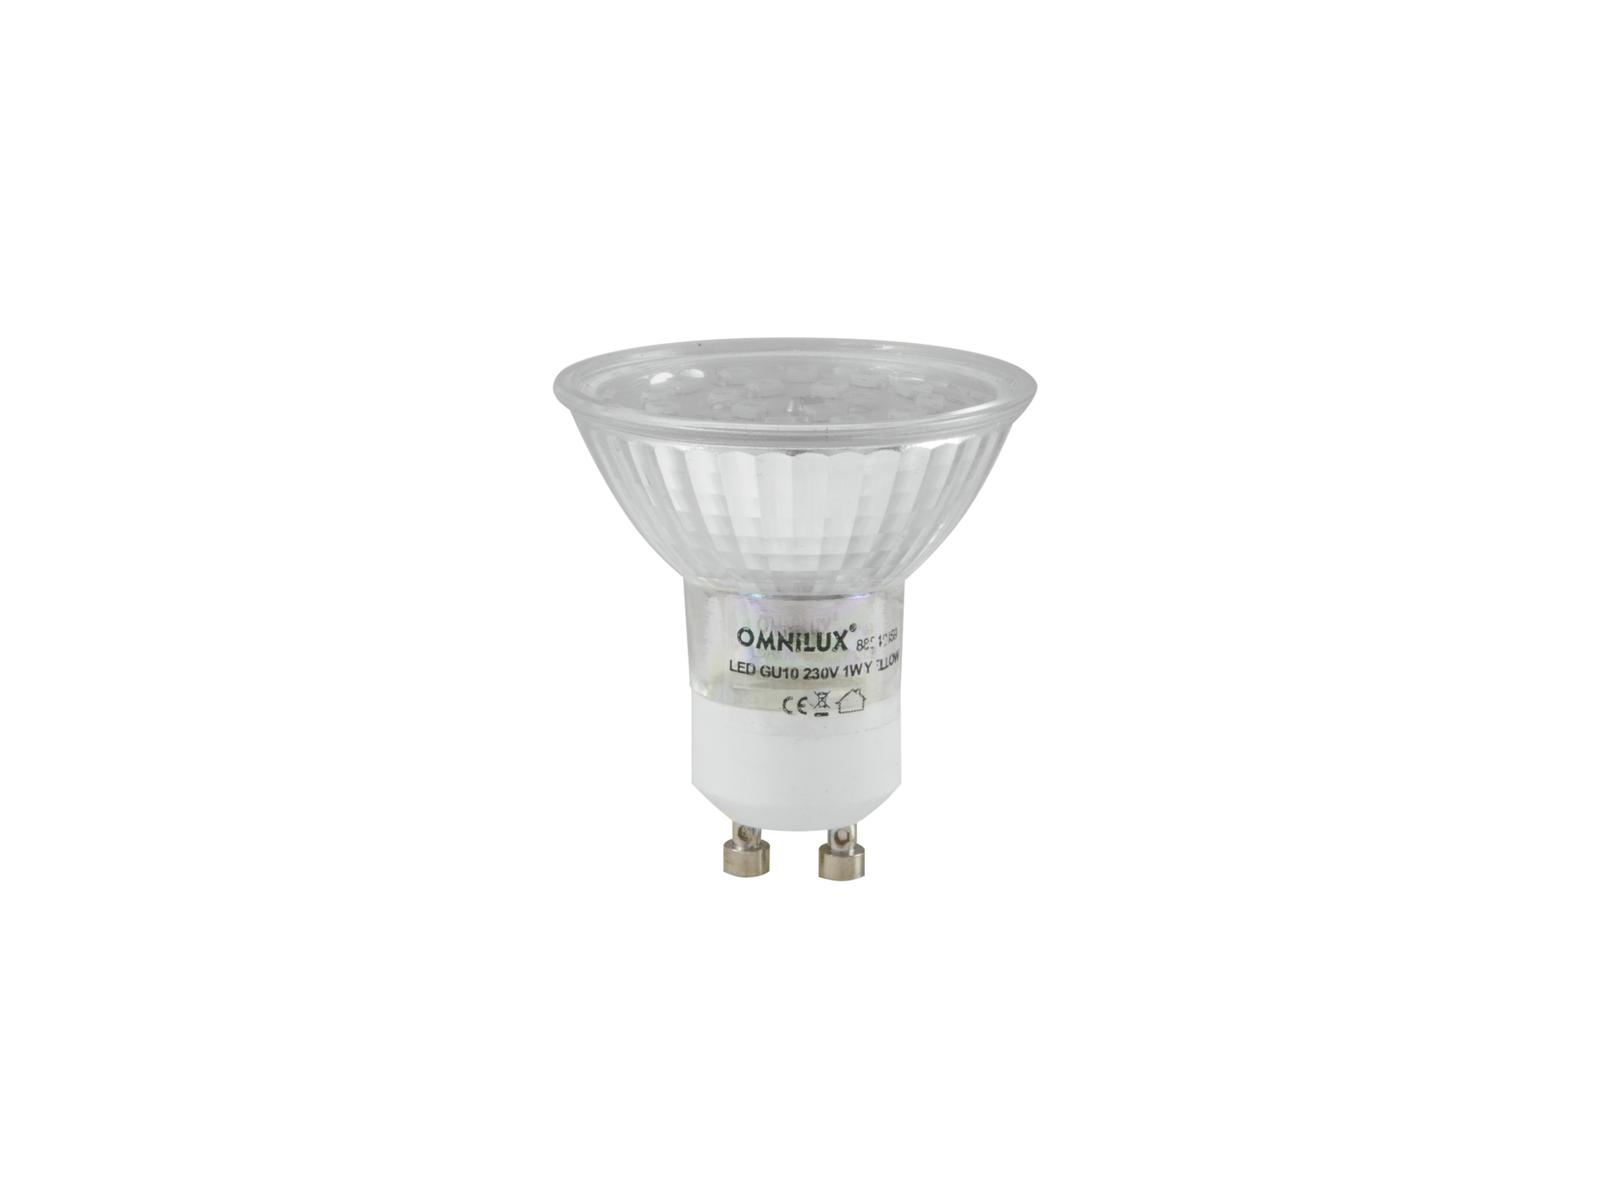 Fotografie 230V GU-10 18 LED Omnilux, UV aktivní